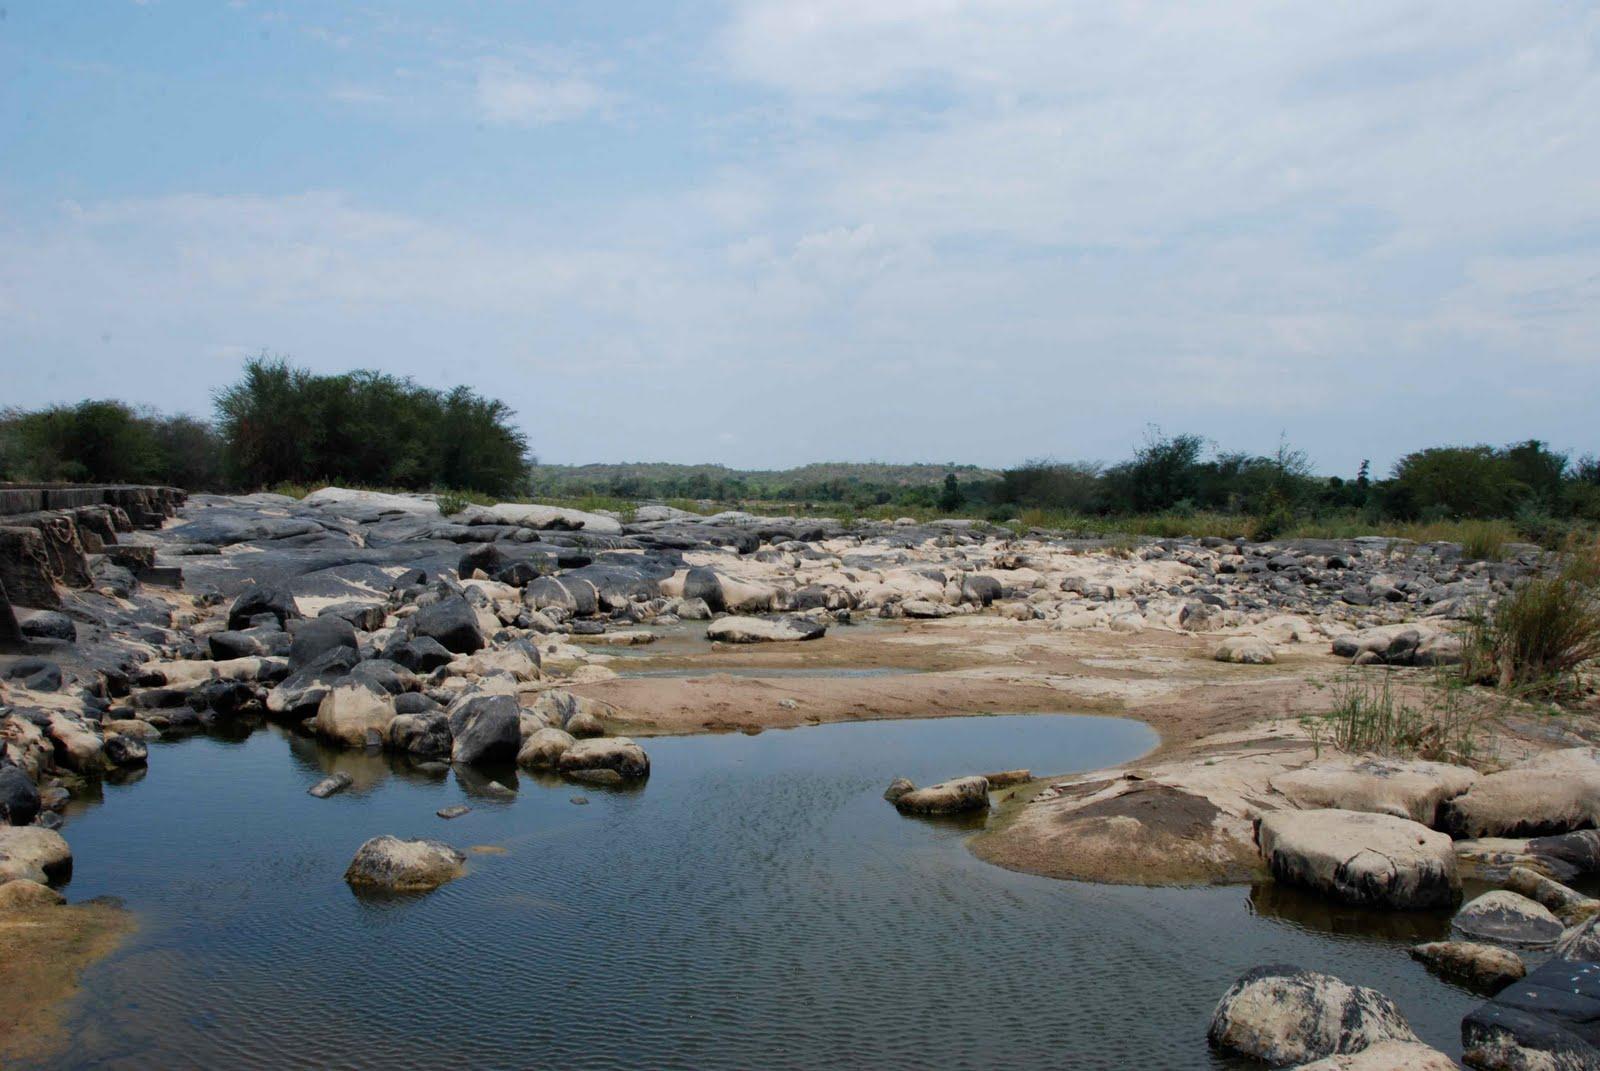 Limpopo Nehri nerede